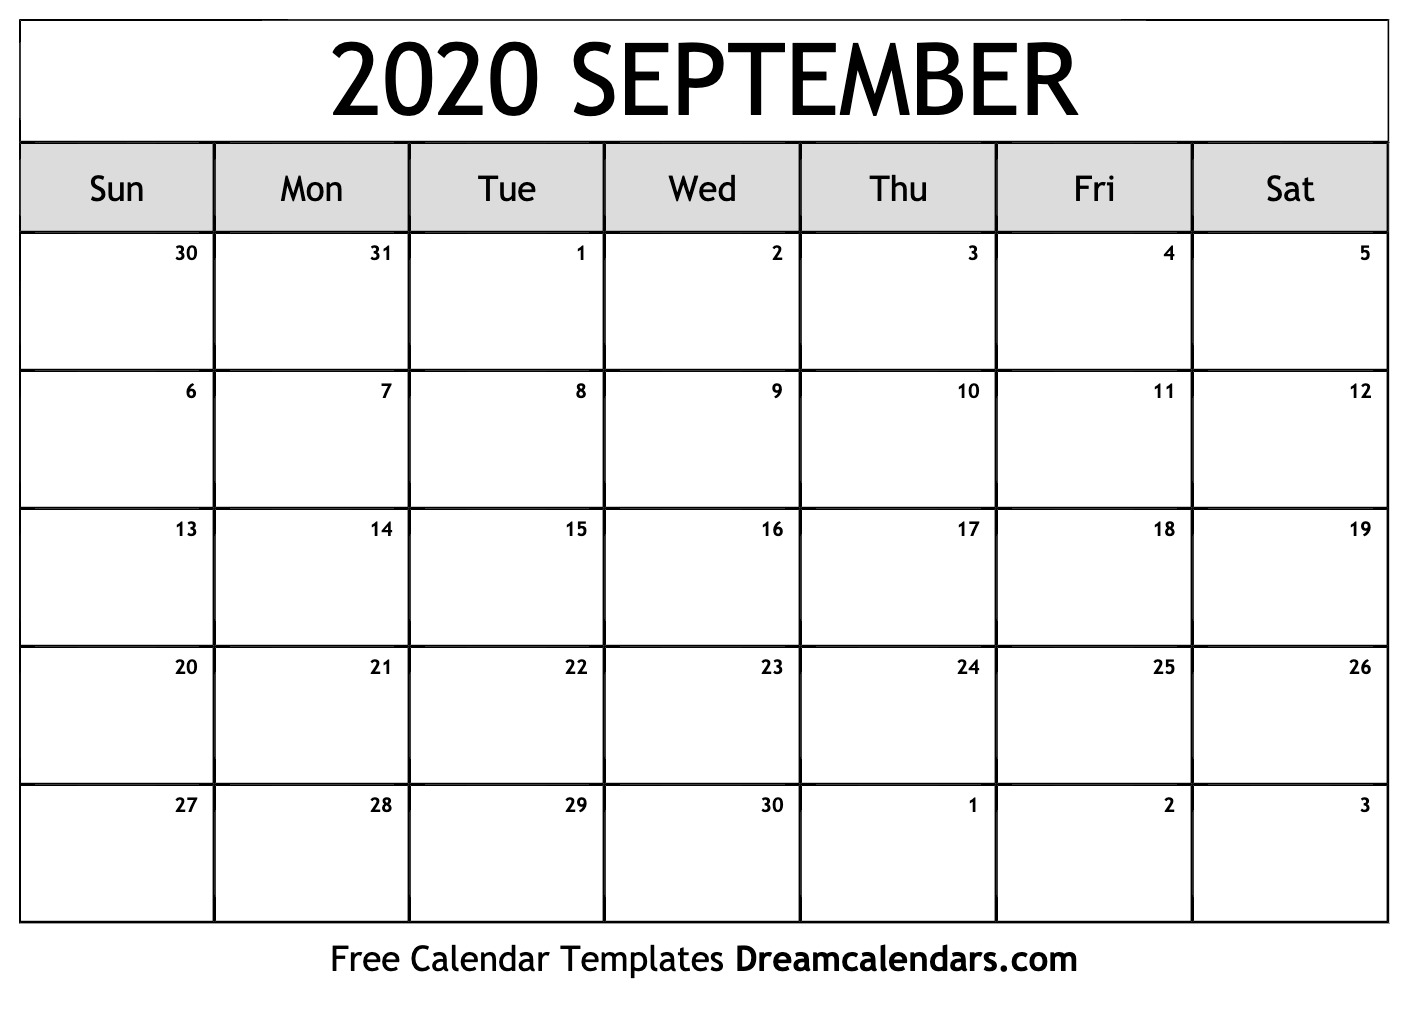 September 2020 Calendar Printable Printable September 2020 Calendar